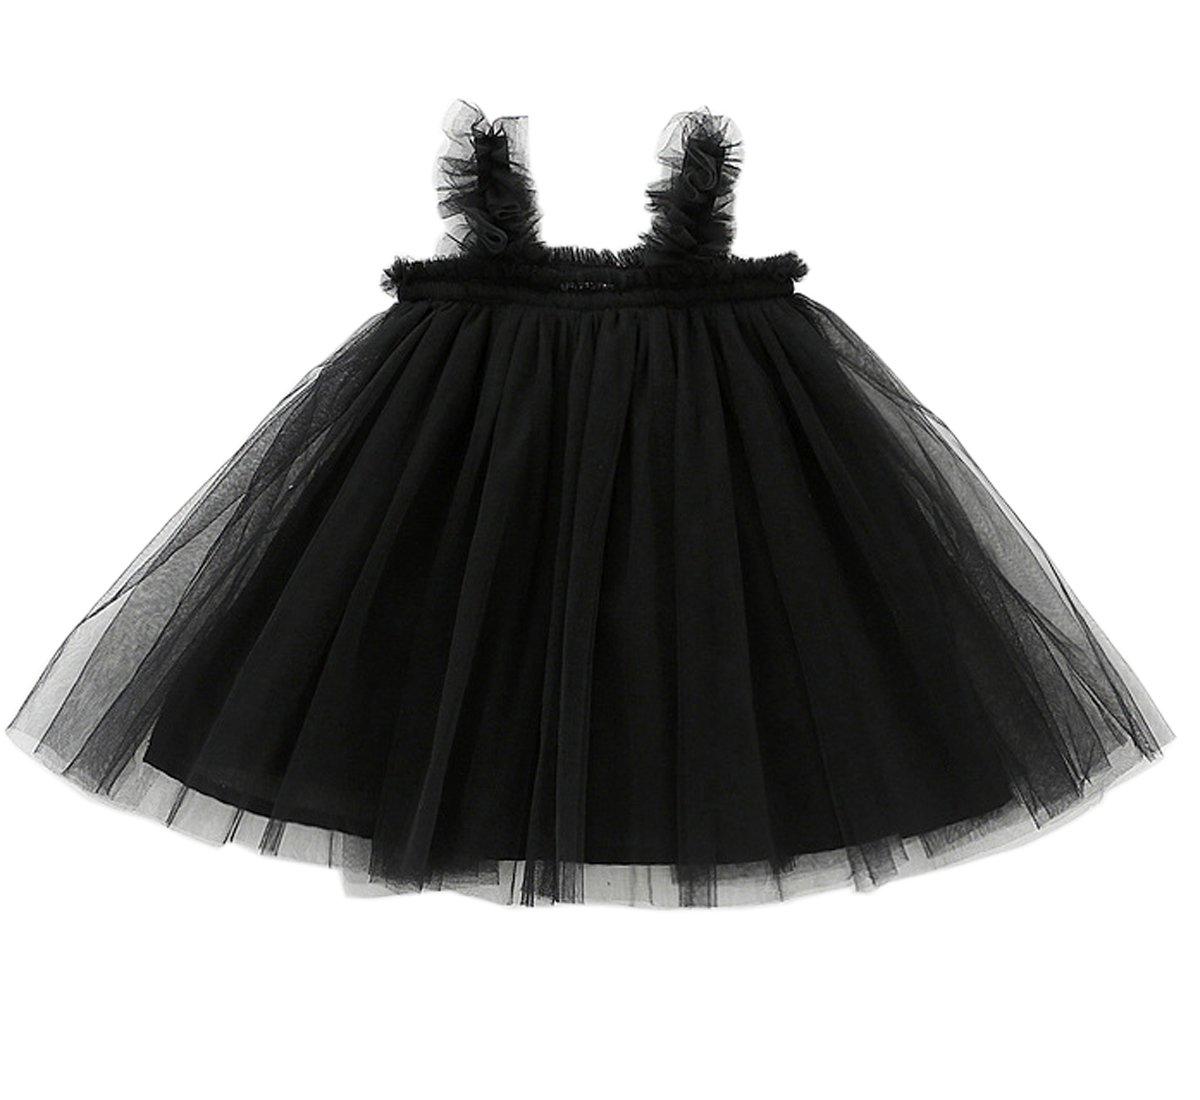 LYXIOF Baby Girls Tutu Dresses Sleeveless Princess Dress Infant Tulle Dress Toddler Sundress Black 18 Months